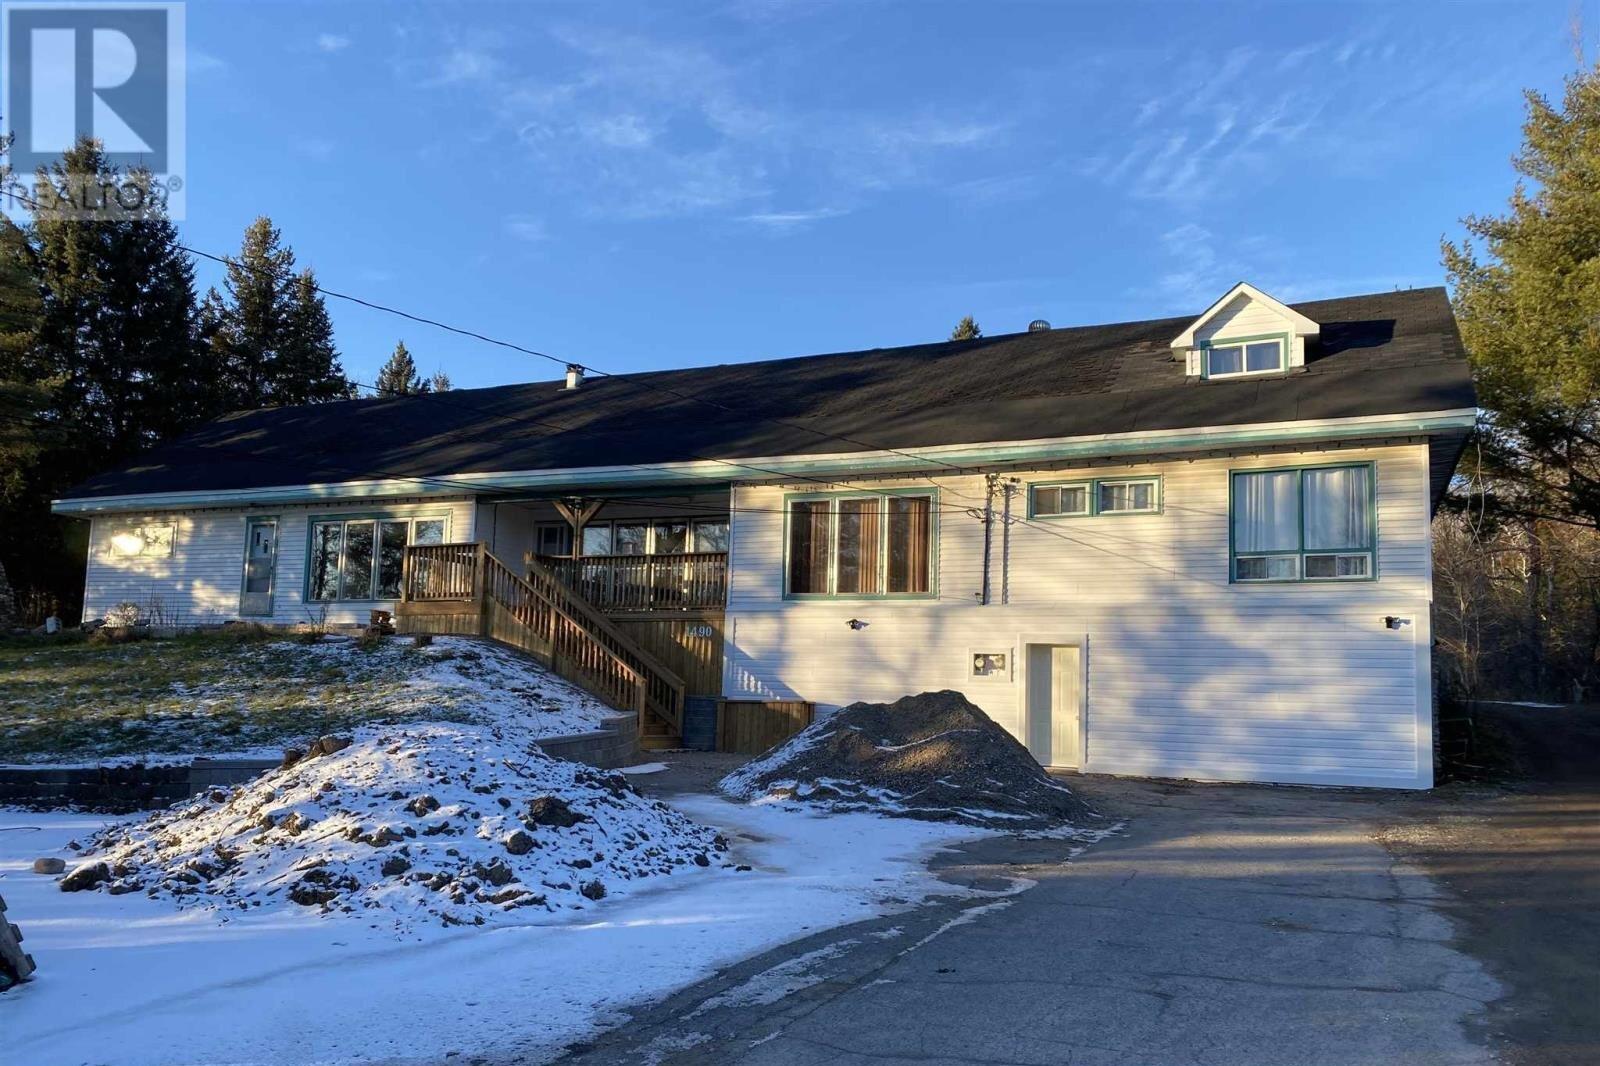 Townhouse for sale at 1490 Korah Rd Sault Ste. Marie Ontario - MLS: SM128941